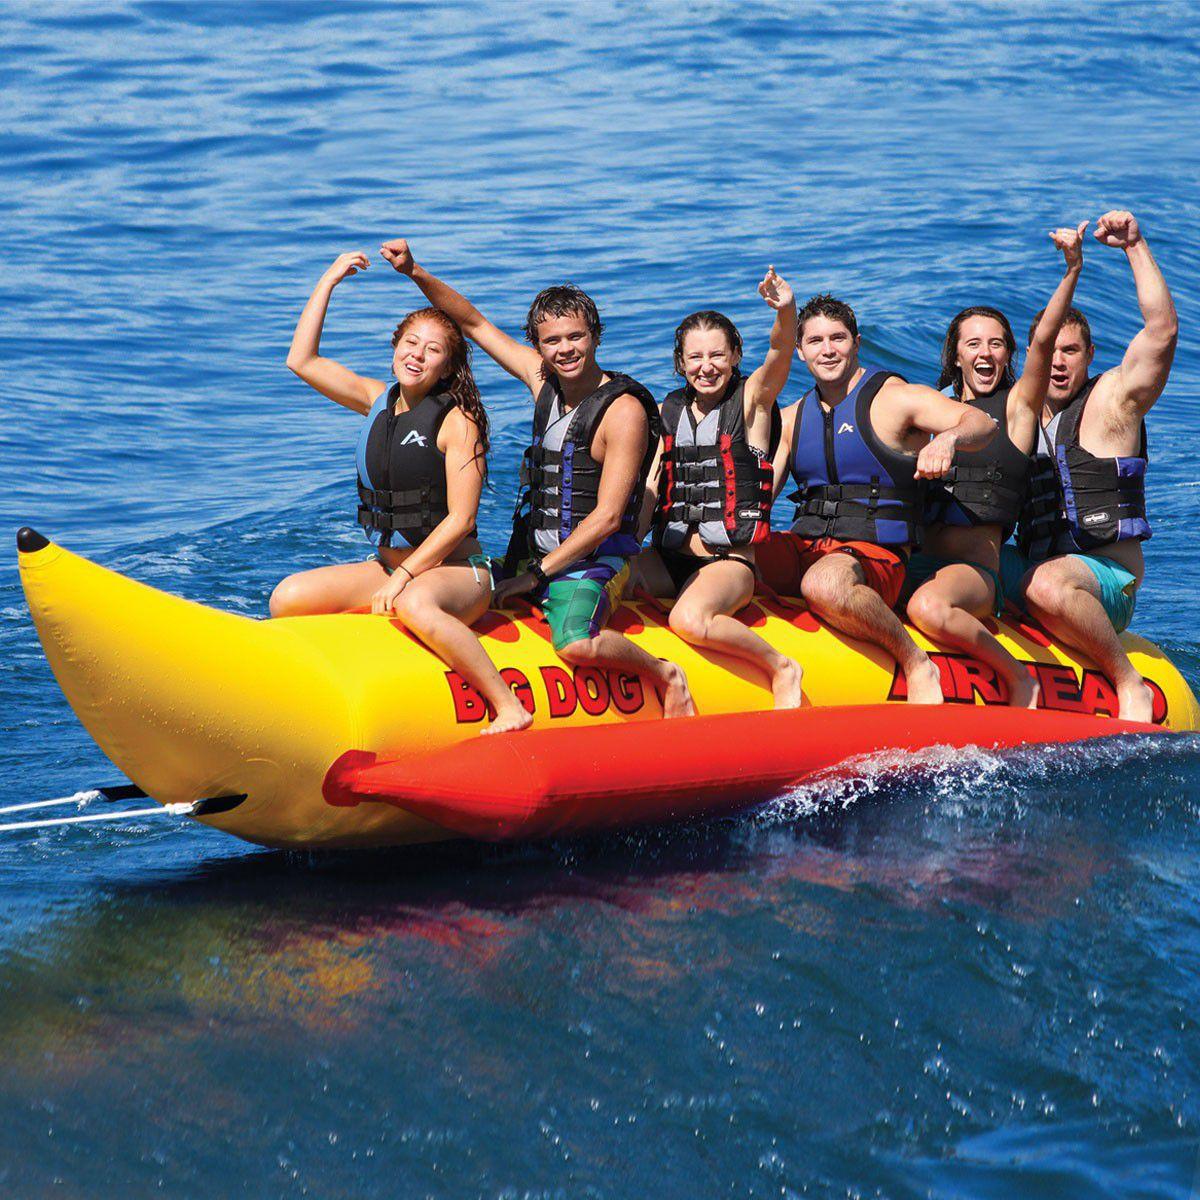 6 Person Max Towed Banana Buoy Big Dog Airhead Videos Boat Tow Harness